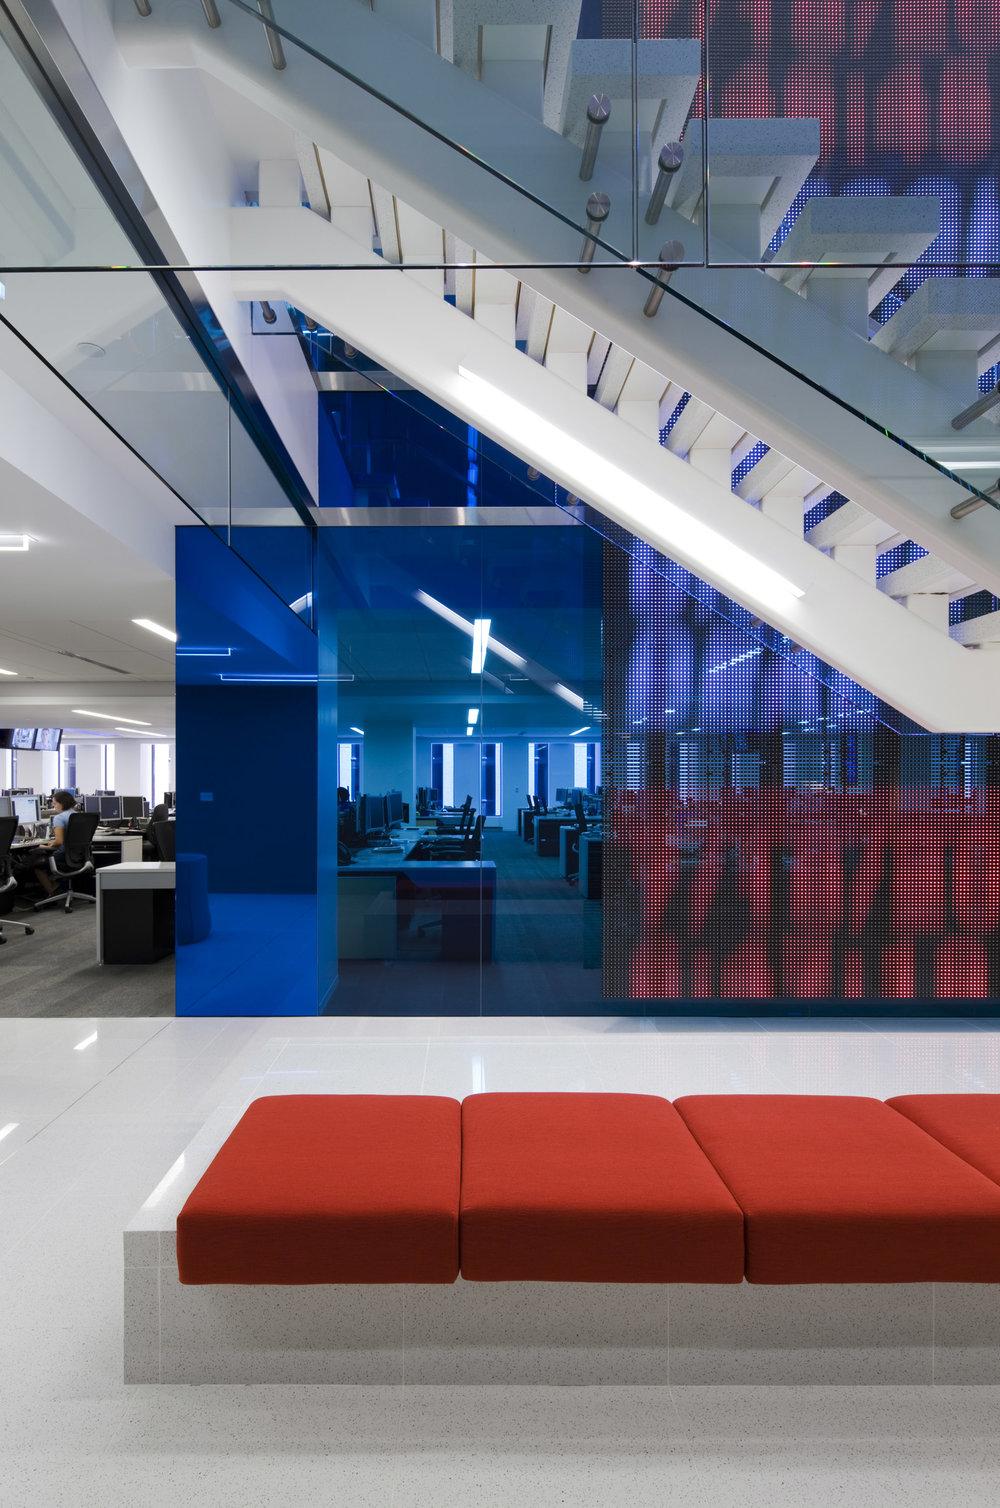 Dow Jones Office Space, Location: New York NY, Architect: Studios Architecture